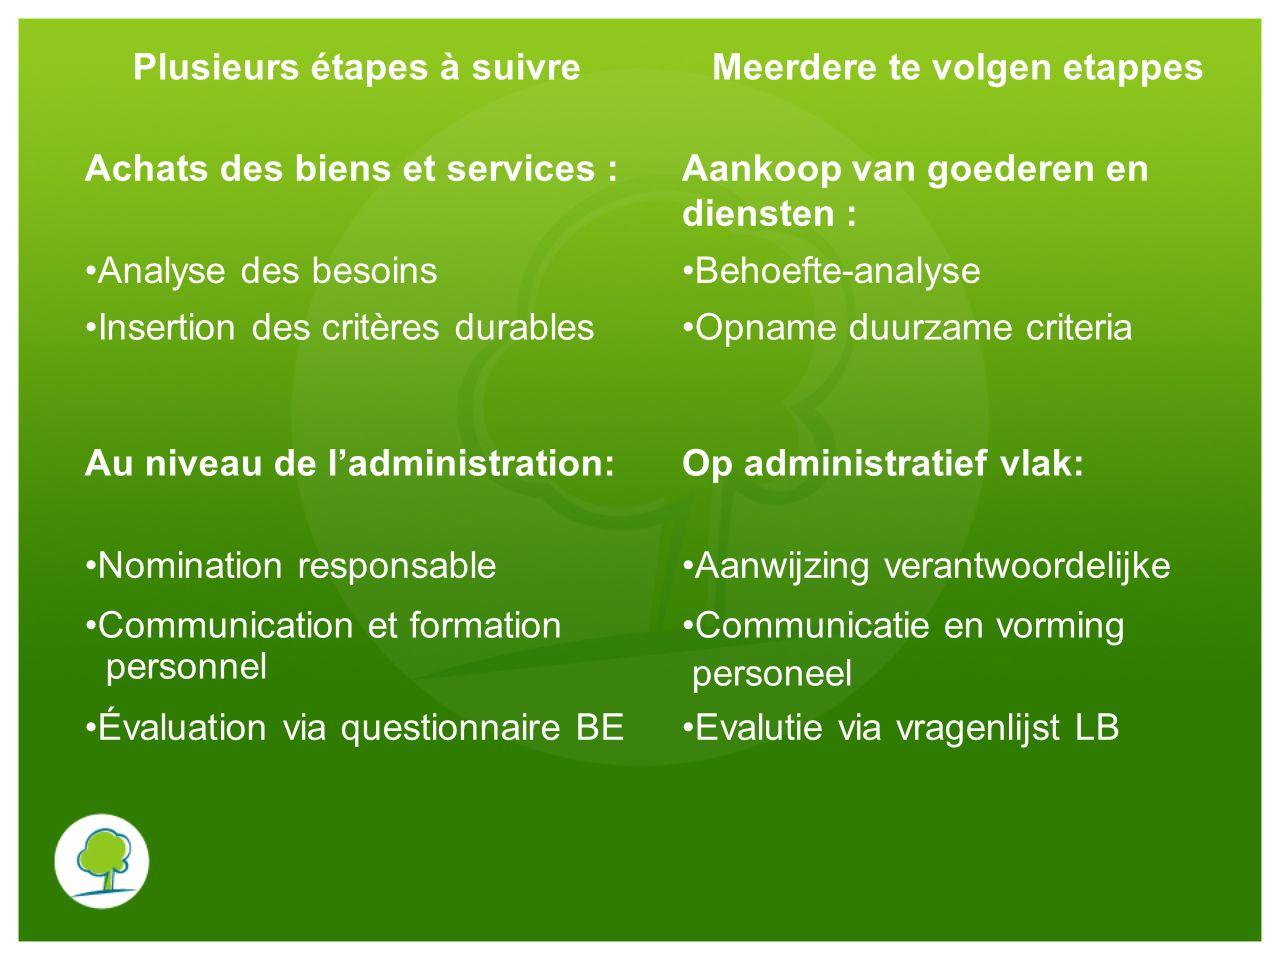 Plusieurs étapes à suivreMeerdere te volgen etappes Achats des biens et services :Aankoop van goederen en diensten : Analyse des besoinsBehoefte-analy